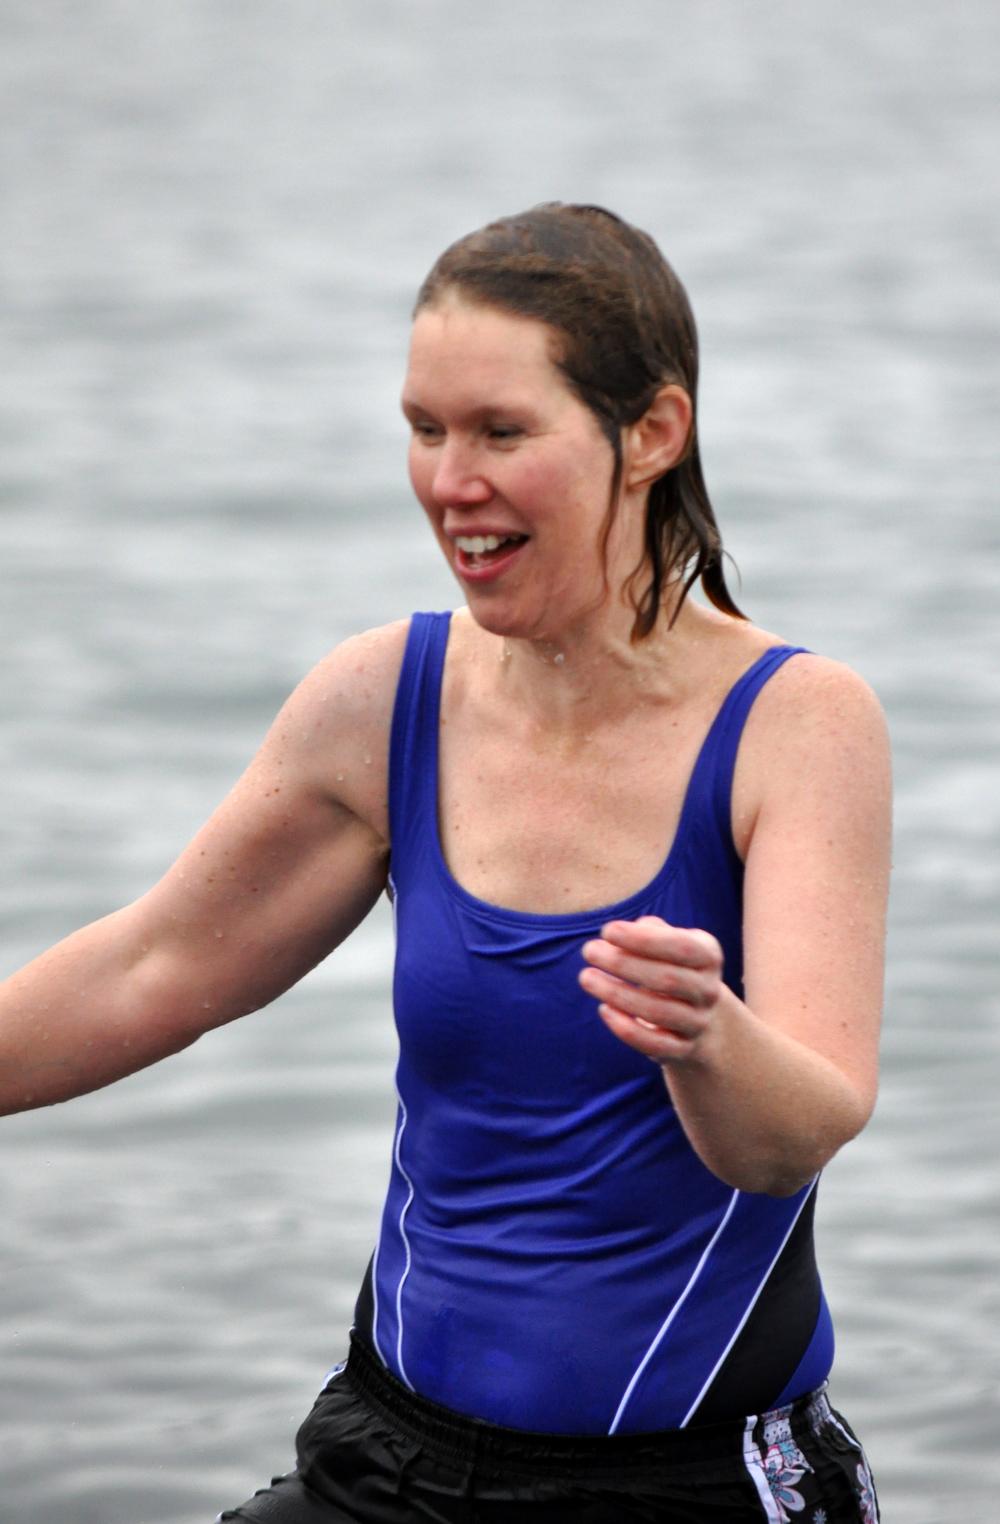 Maggie at the 2014 Sooke Polar Bear Swim